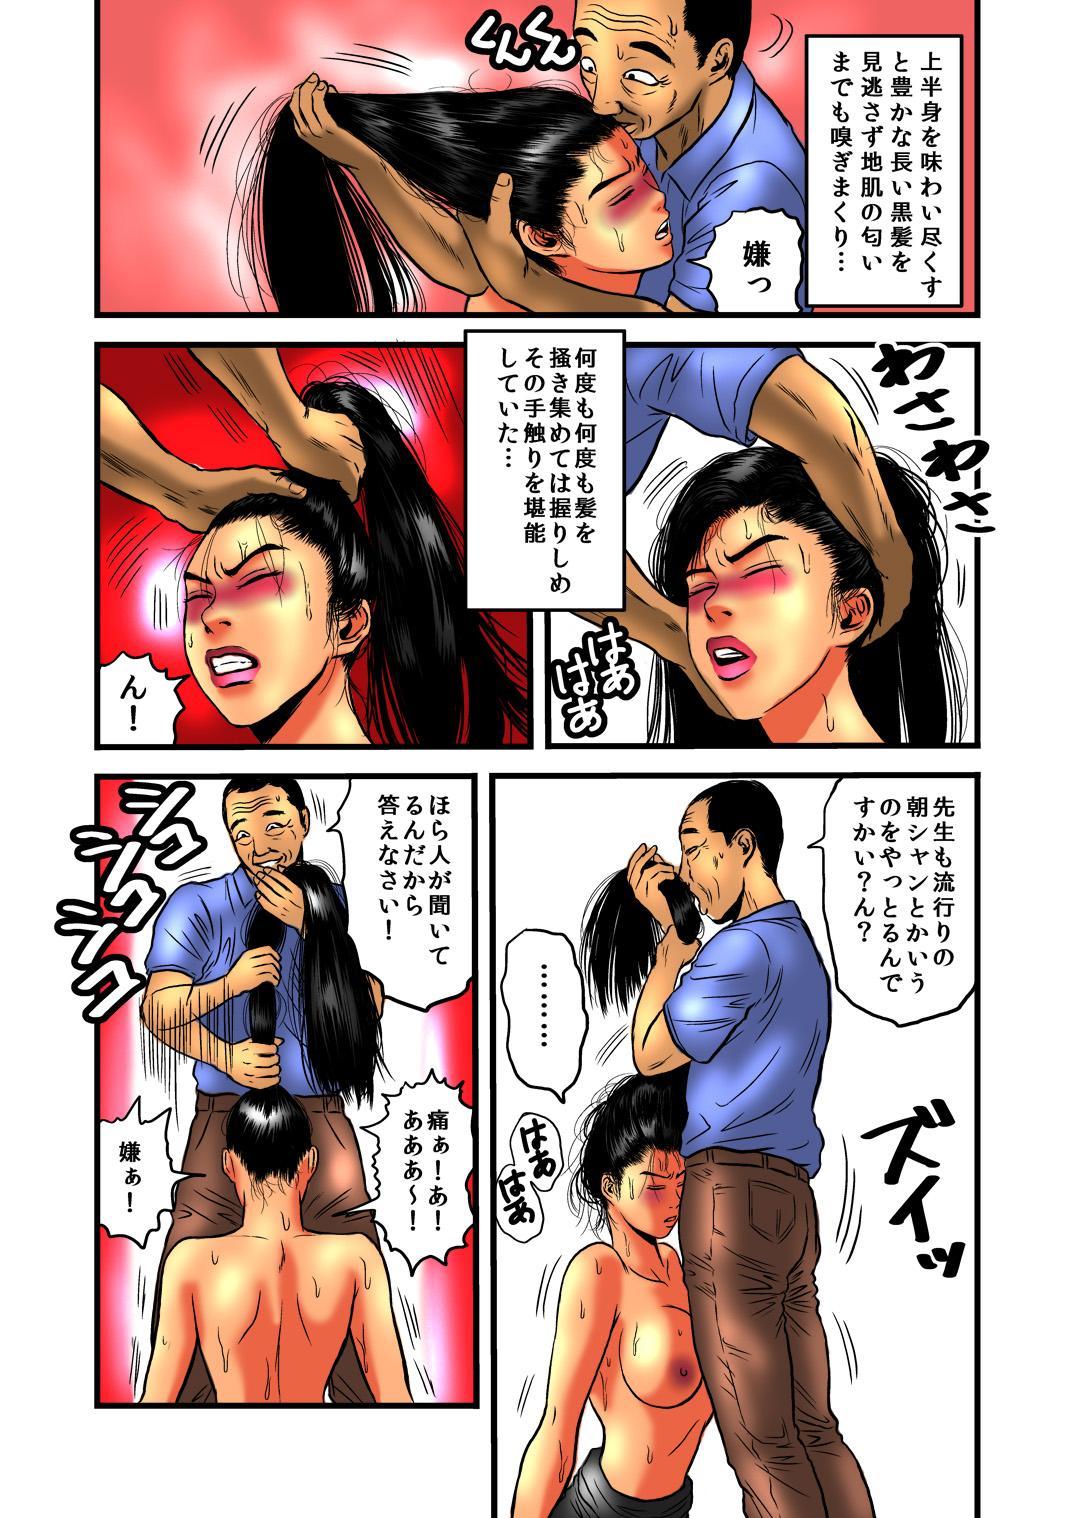 Ryoujoku no Katei Houmon ・ Zenpen 9